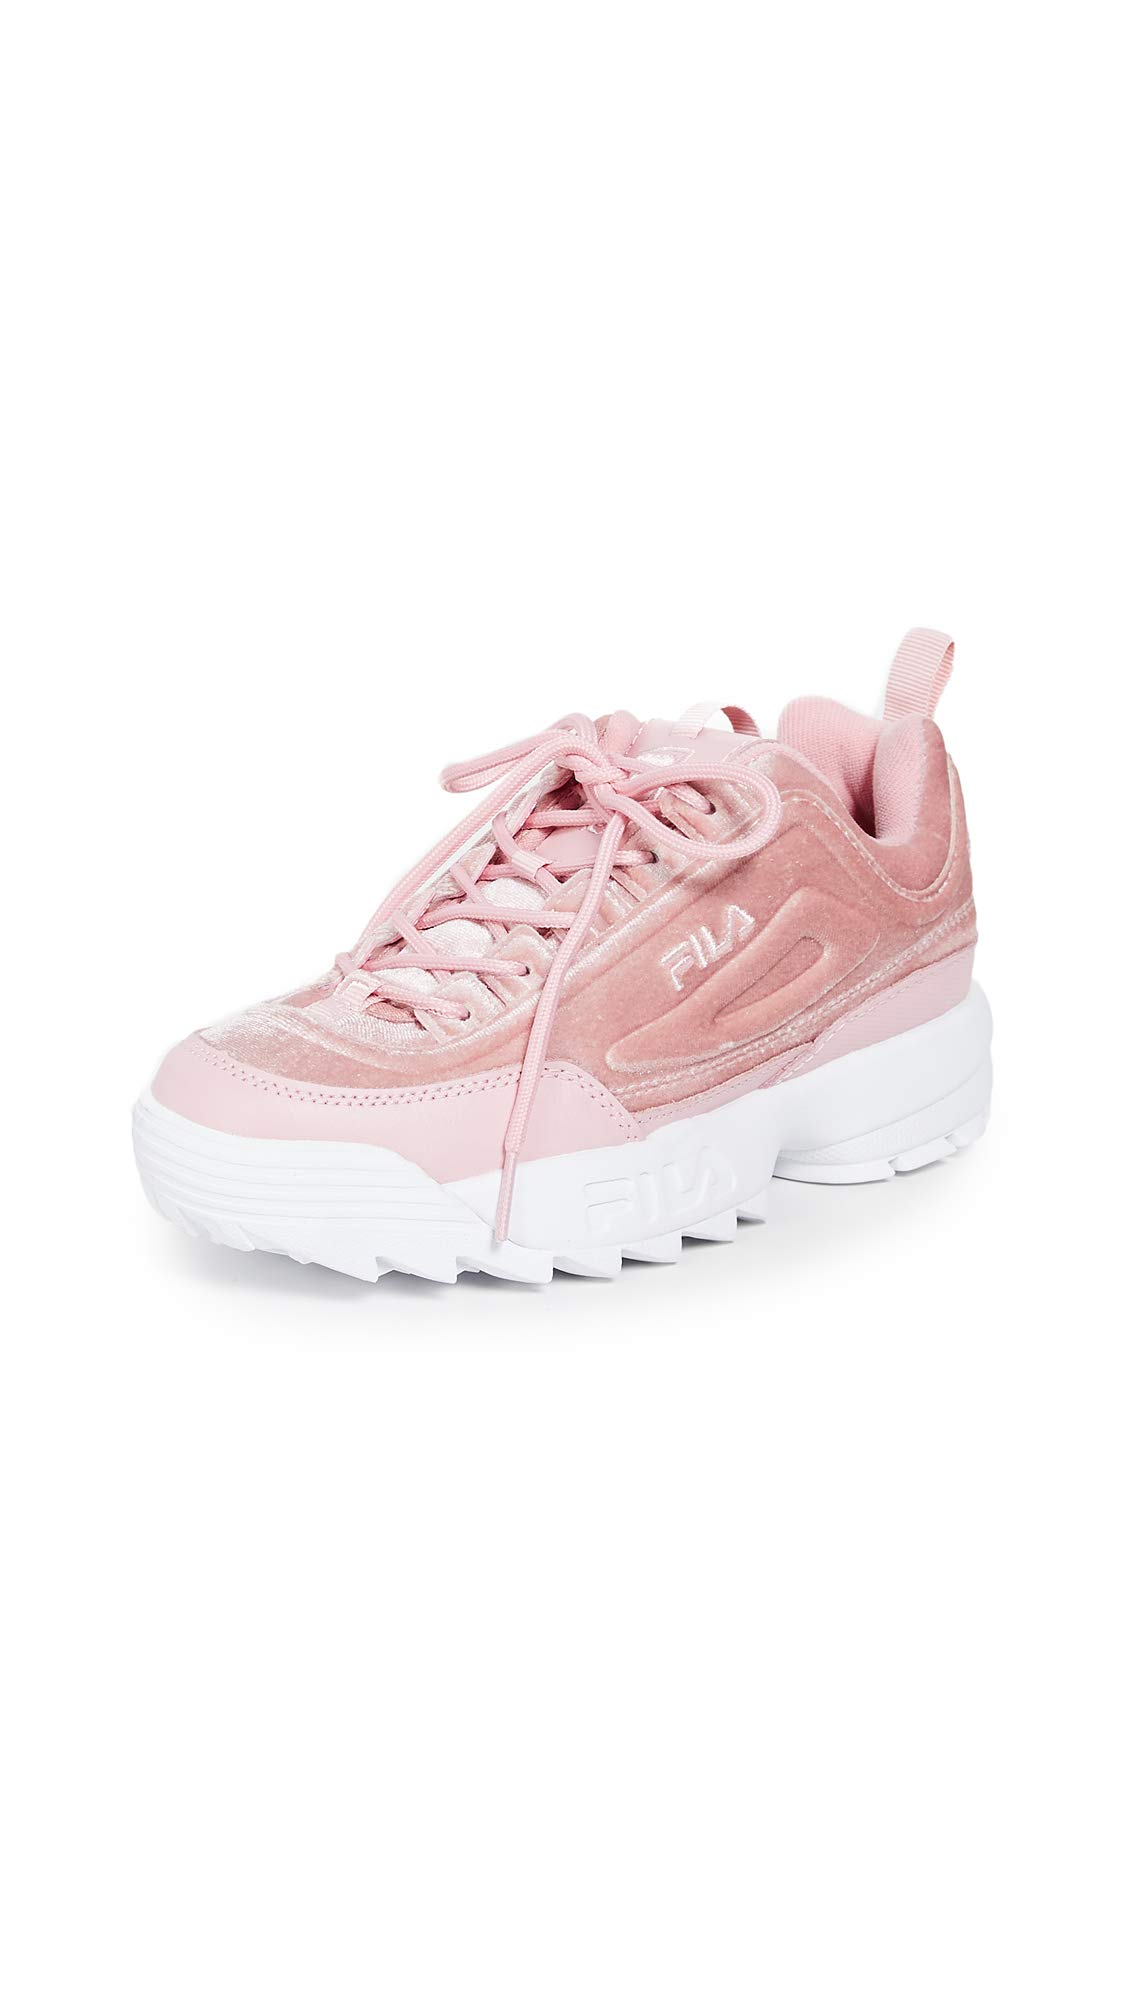 Fila Women's Disruptor II Premium Velour Sneakers, Pink, 9 M US